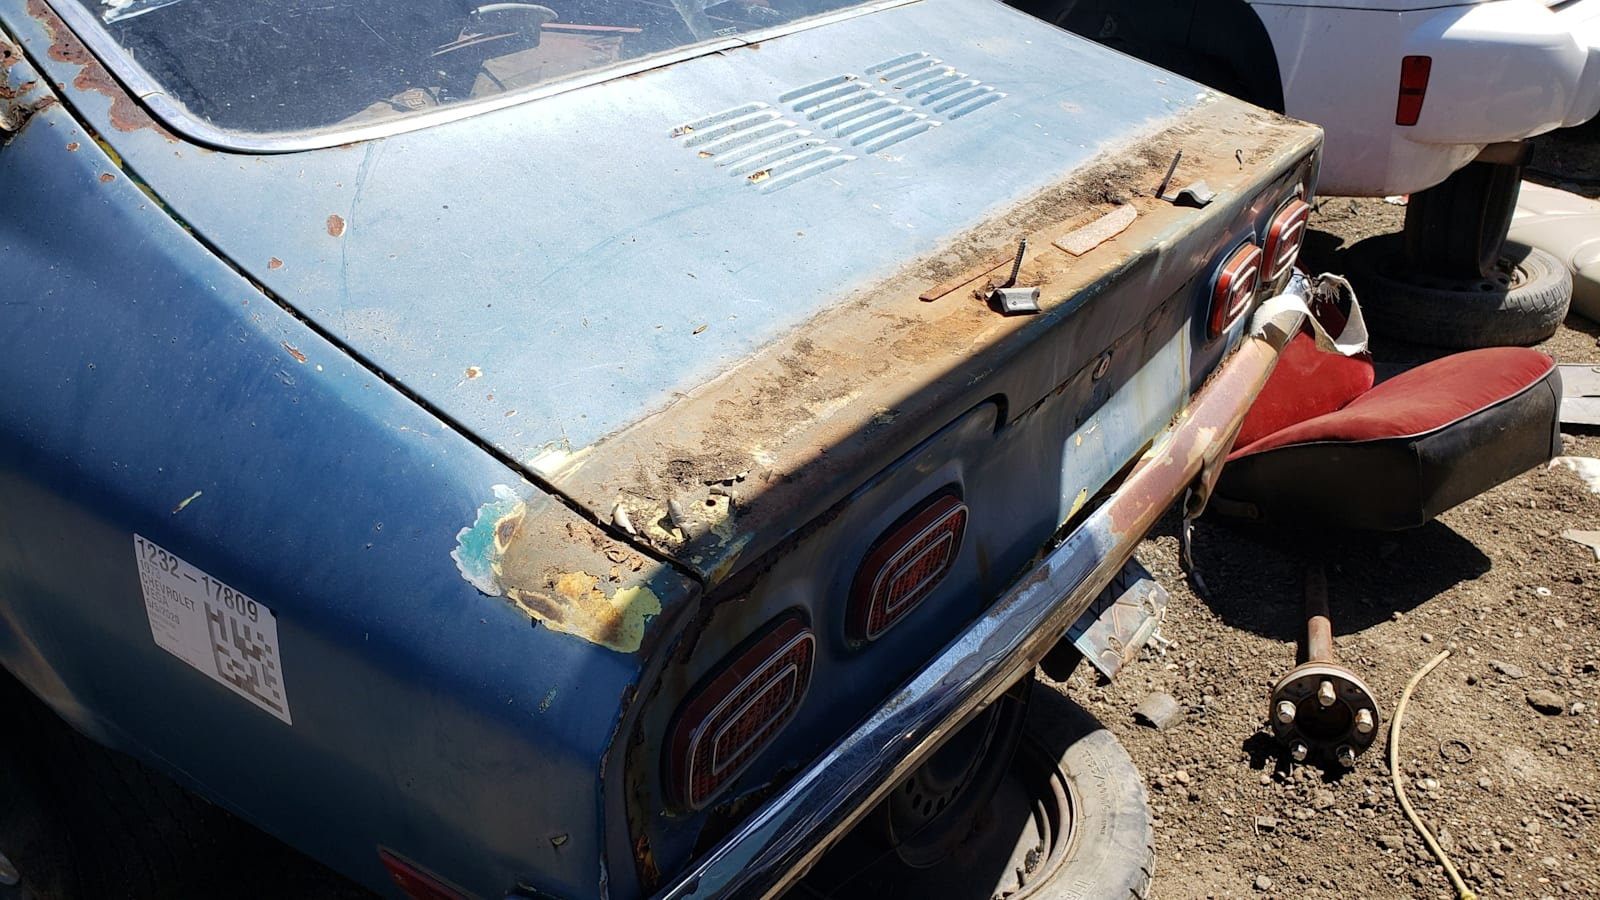 Junkyard Gem: 1973 Chevrolet Vega with V8 Swap